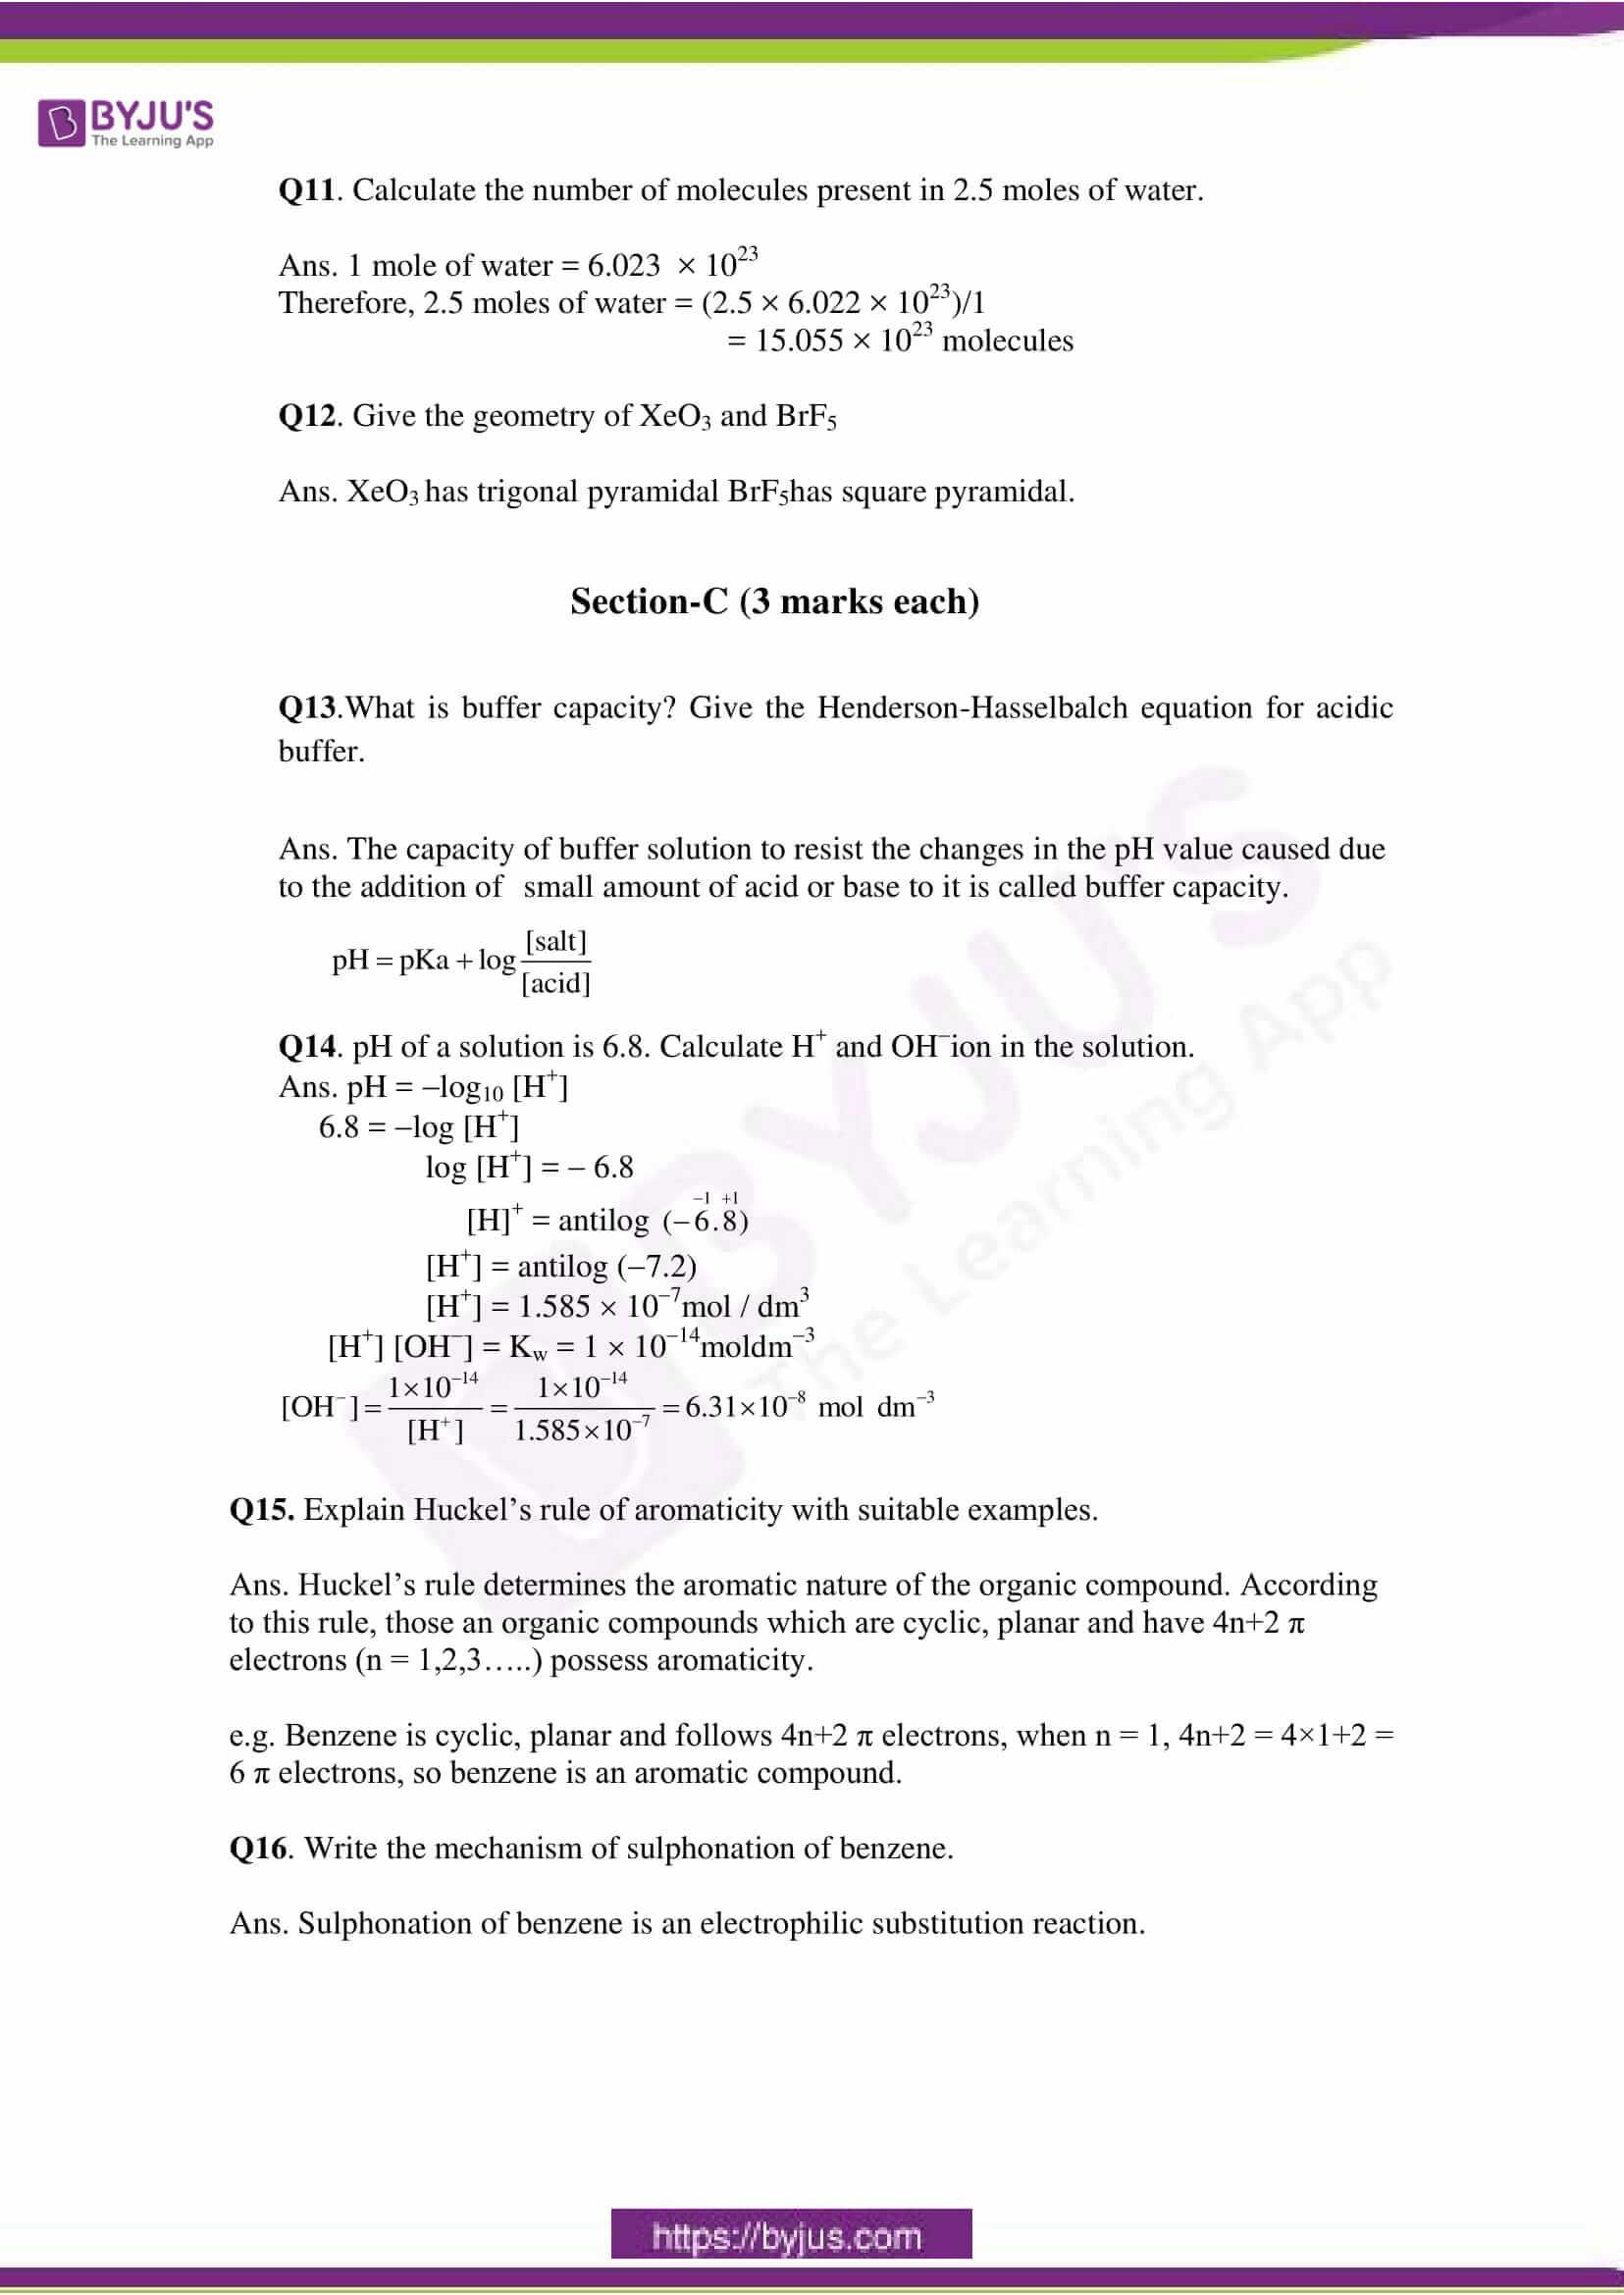 cbse class 11 che sample paper set 1 solution